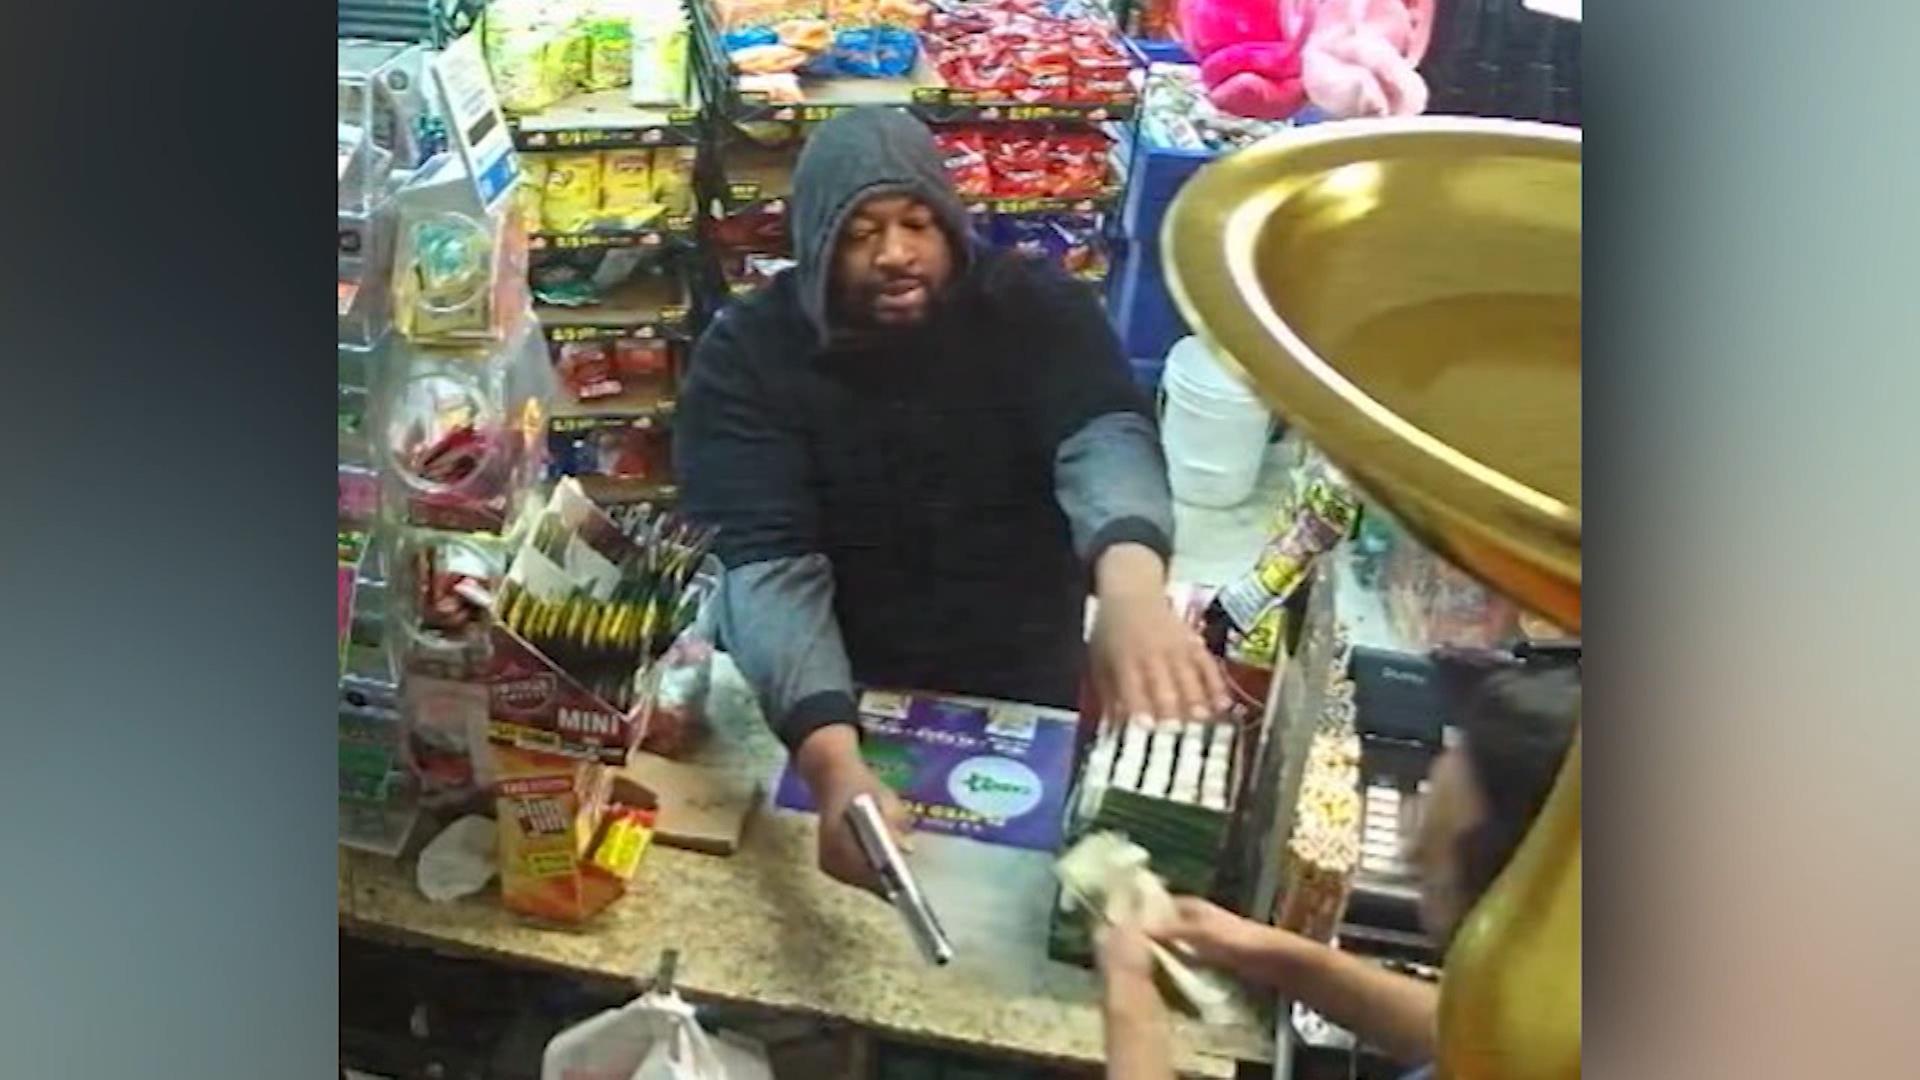 Star Market robbery